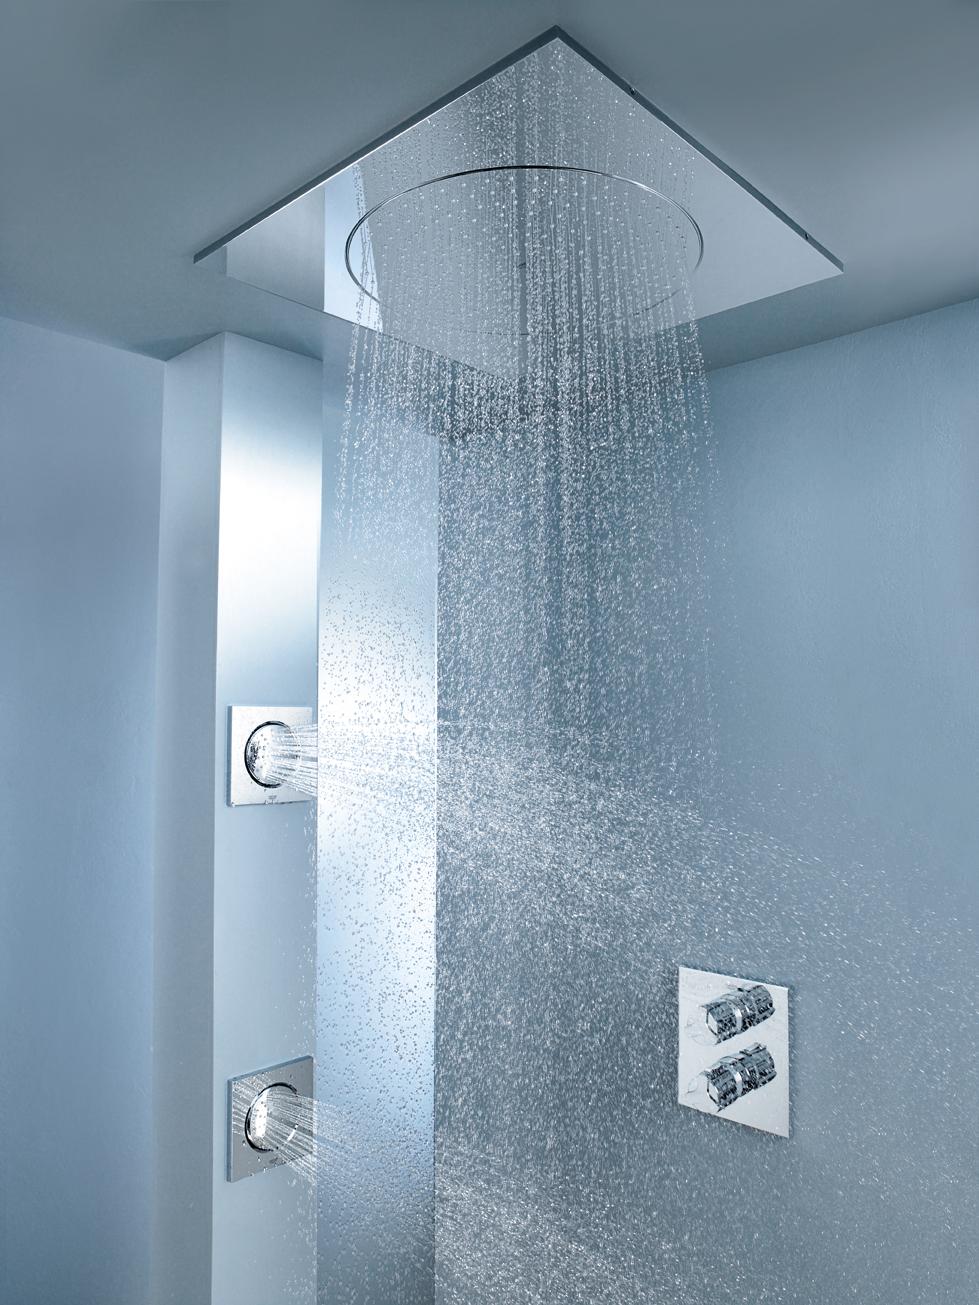 Ducha rainshower f atika for Ducha termostatica grohe